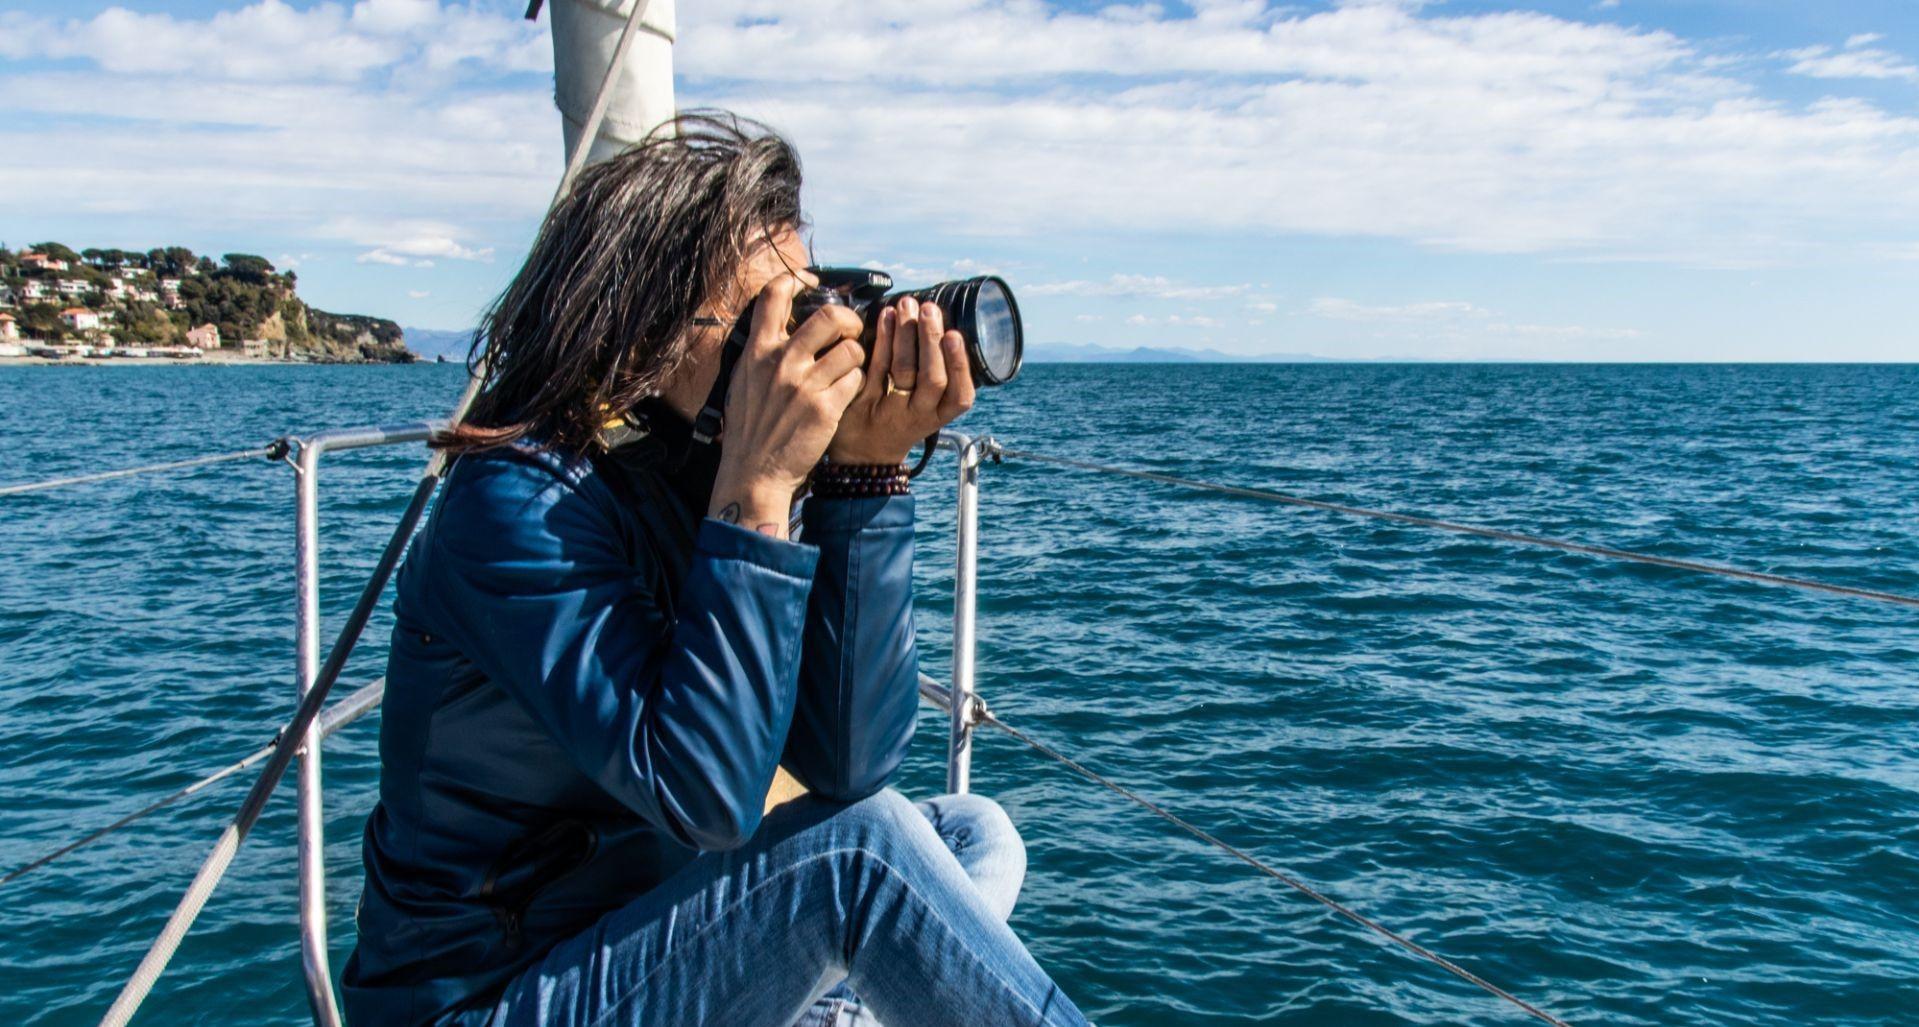 Weekend fotografico in barca a vela a Portofino